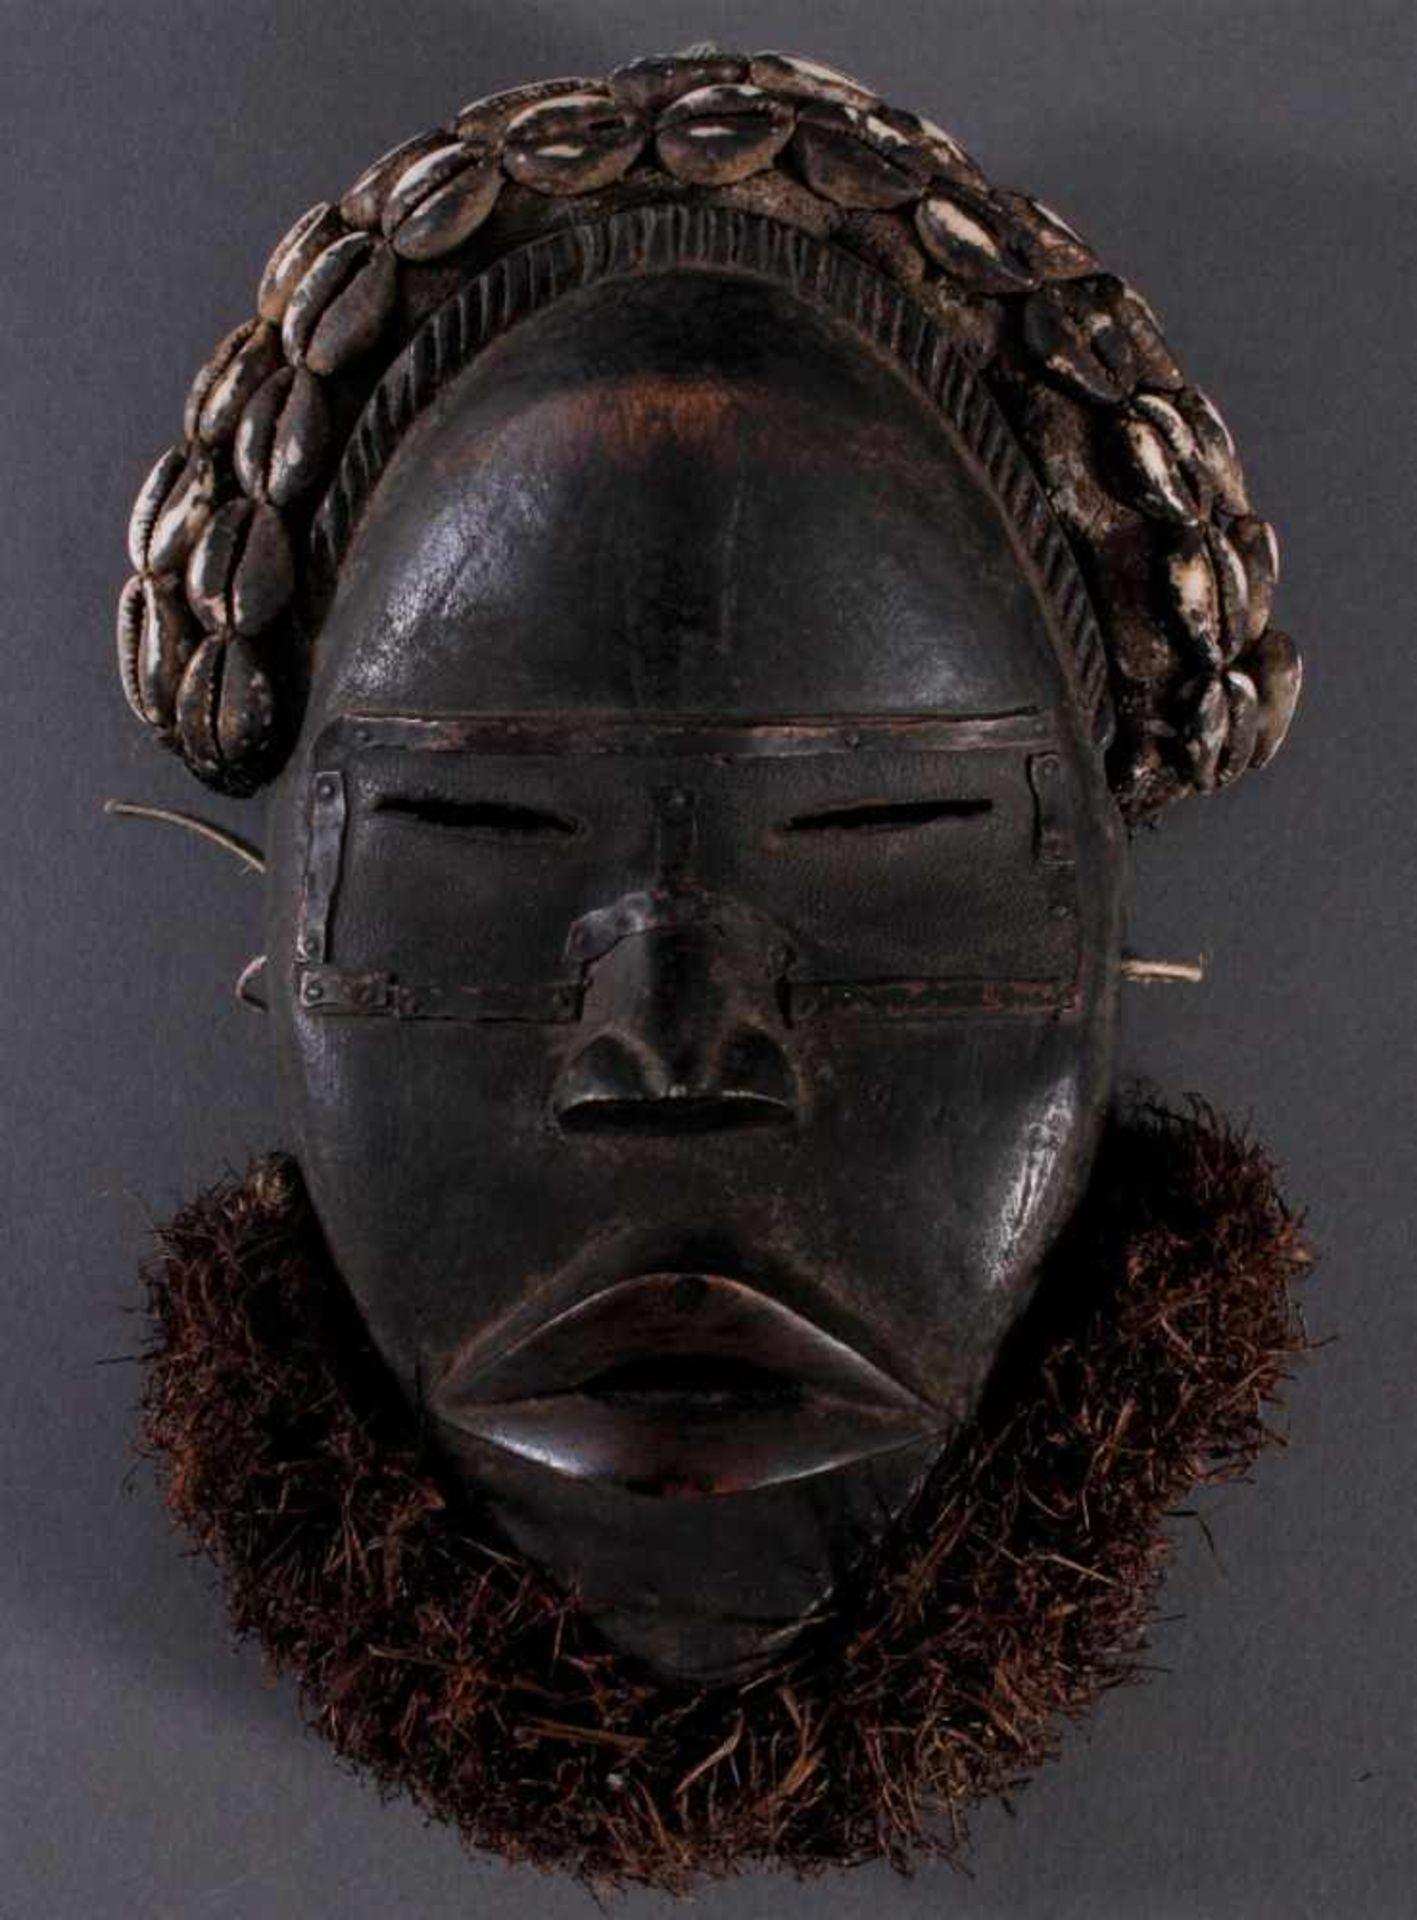 Antike Maske der Dan, Liberia 1. Hälfte 20. Jh.Holz geschnitzt, dunkle Patina, Stoff Haar mit